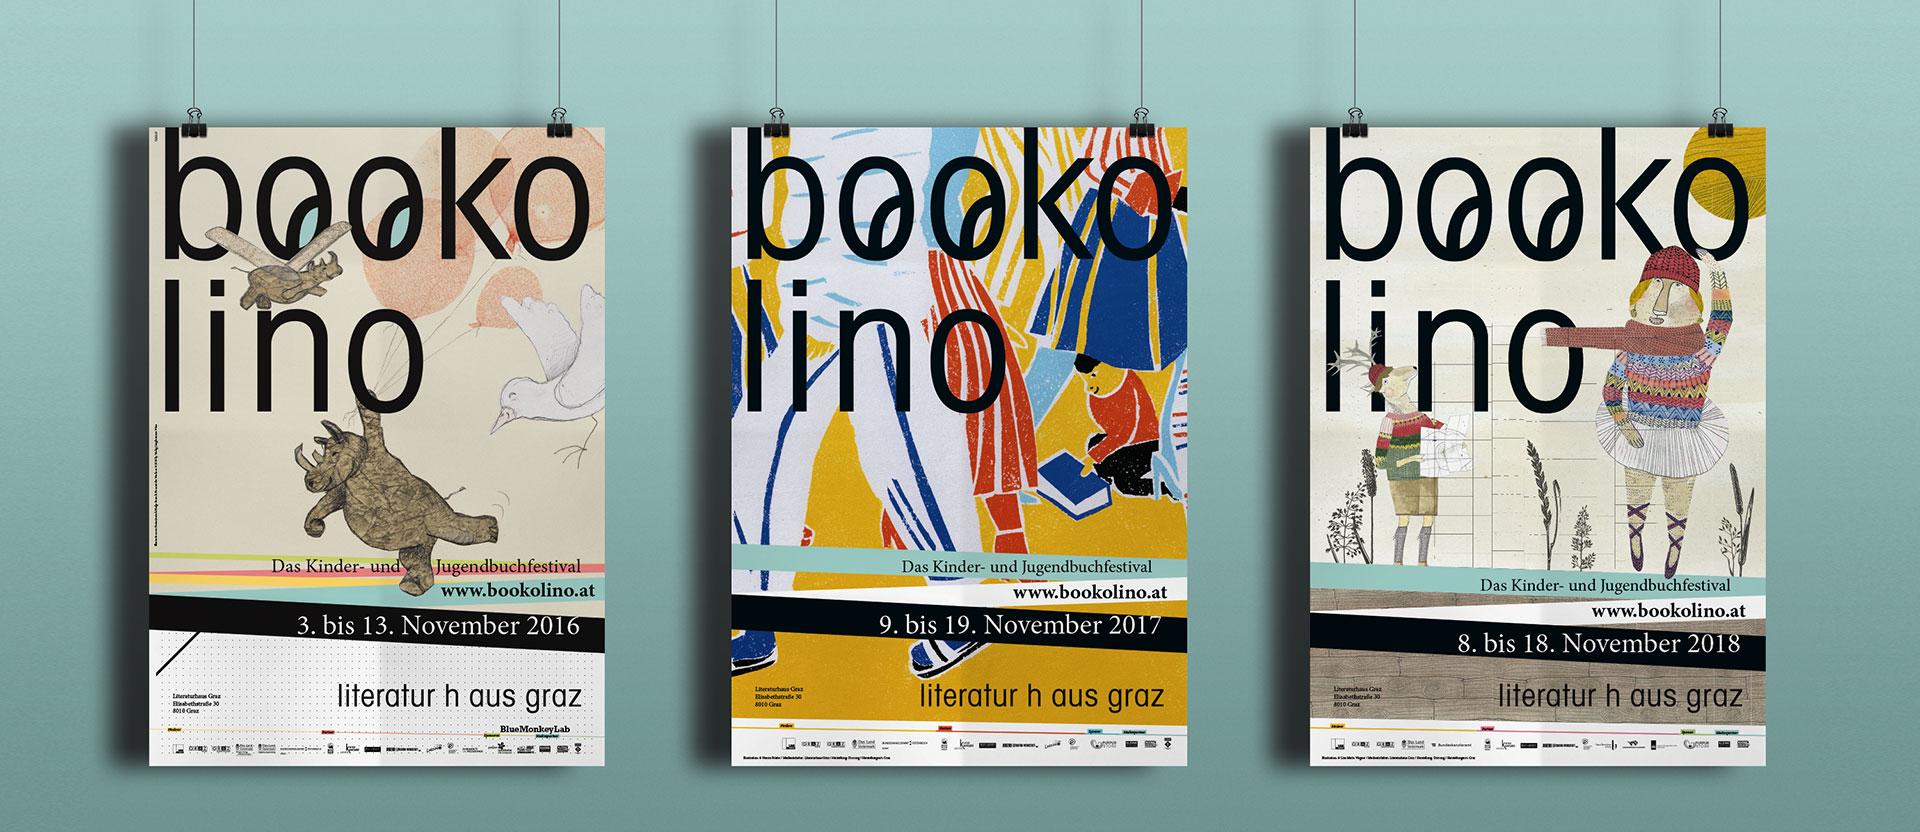 04_Bookolino_Poster_Mockup_Montage